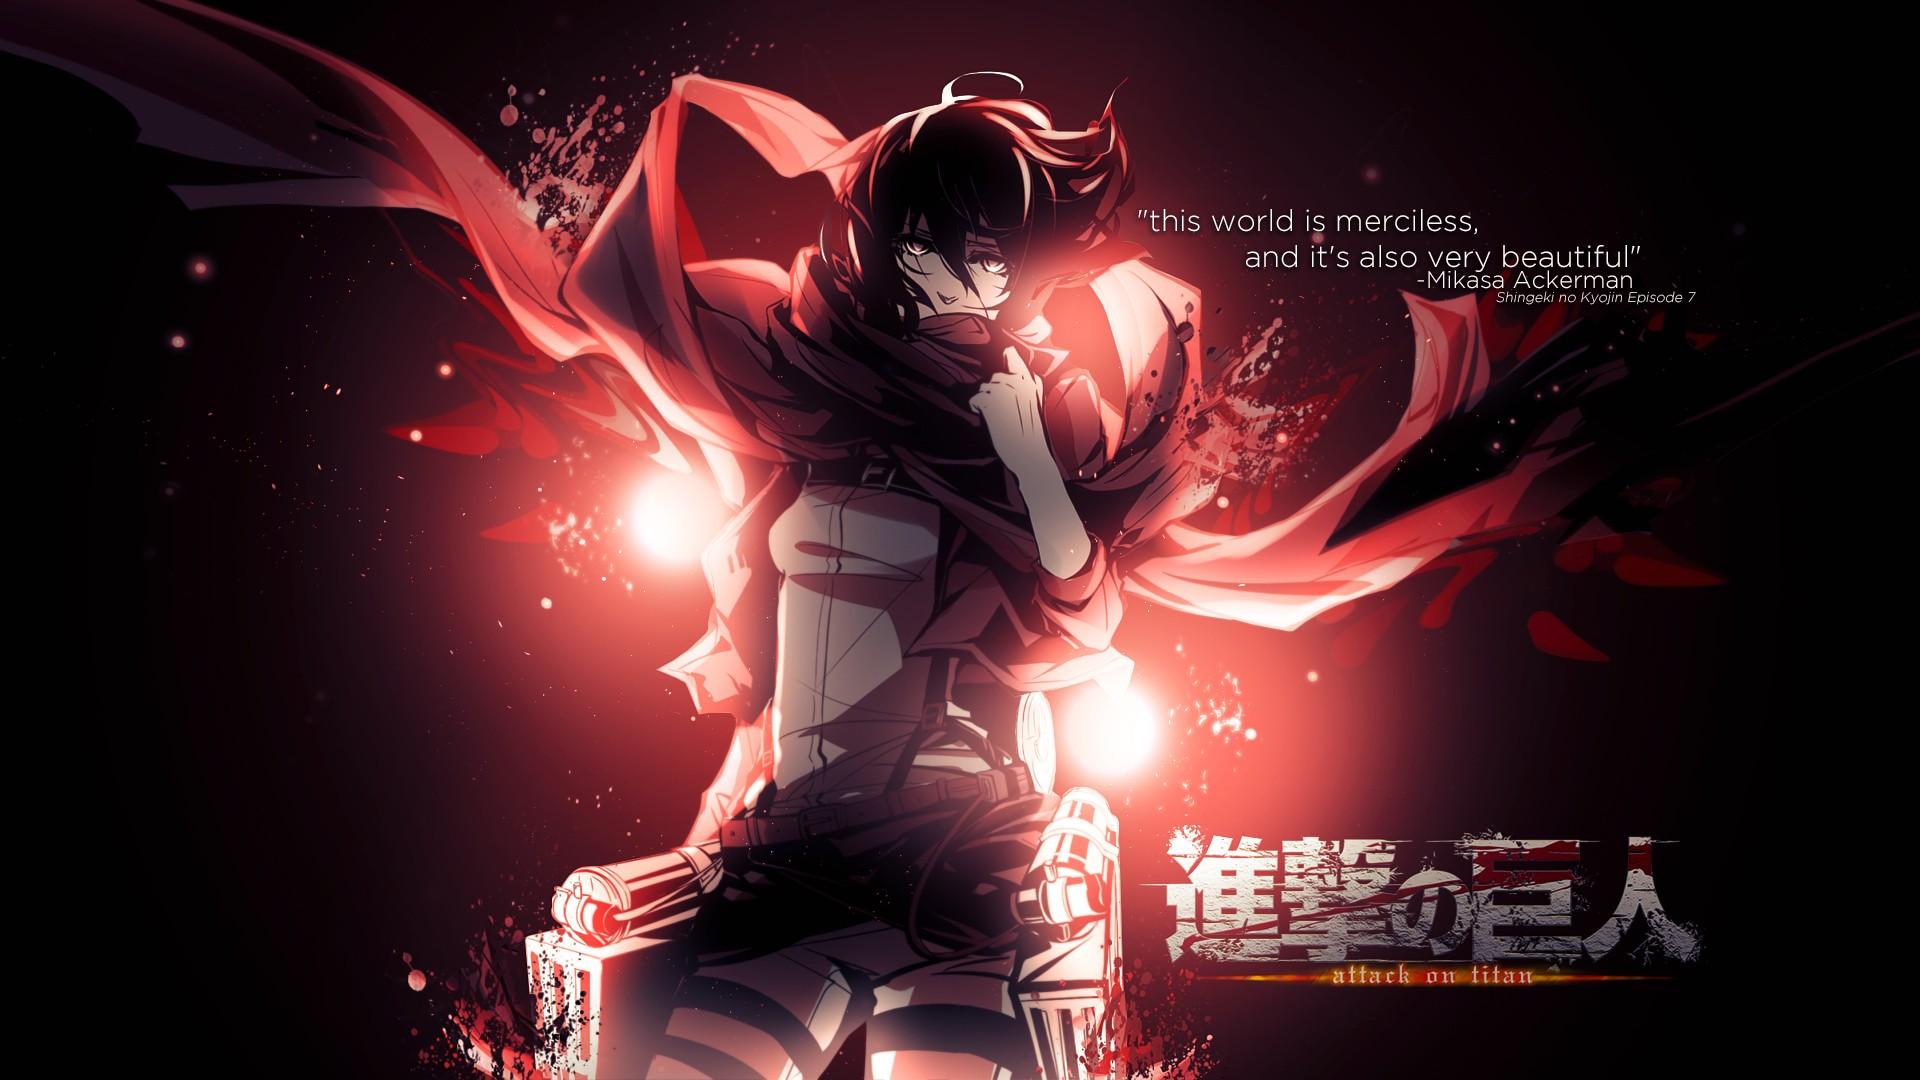 Unduh 7000+ Wallpaper Anime Hd Mikasa  Paling Keren